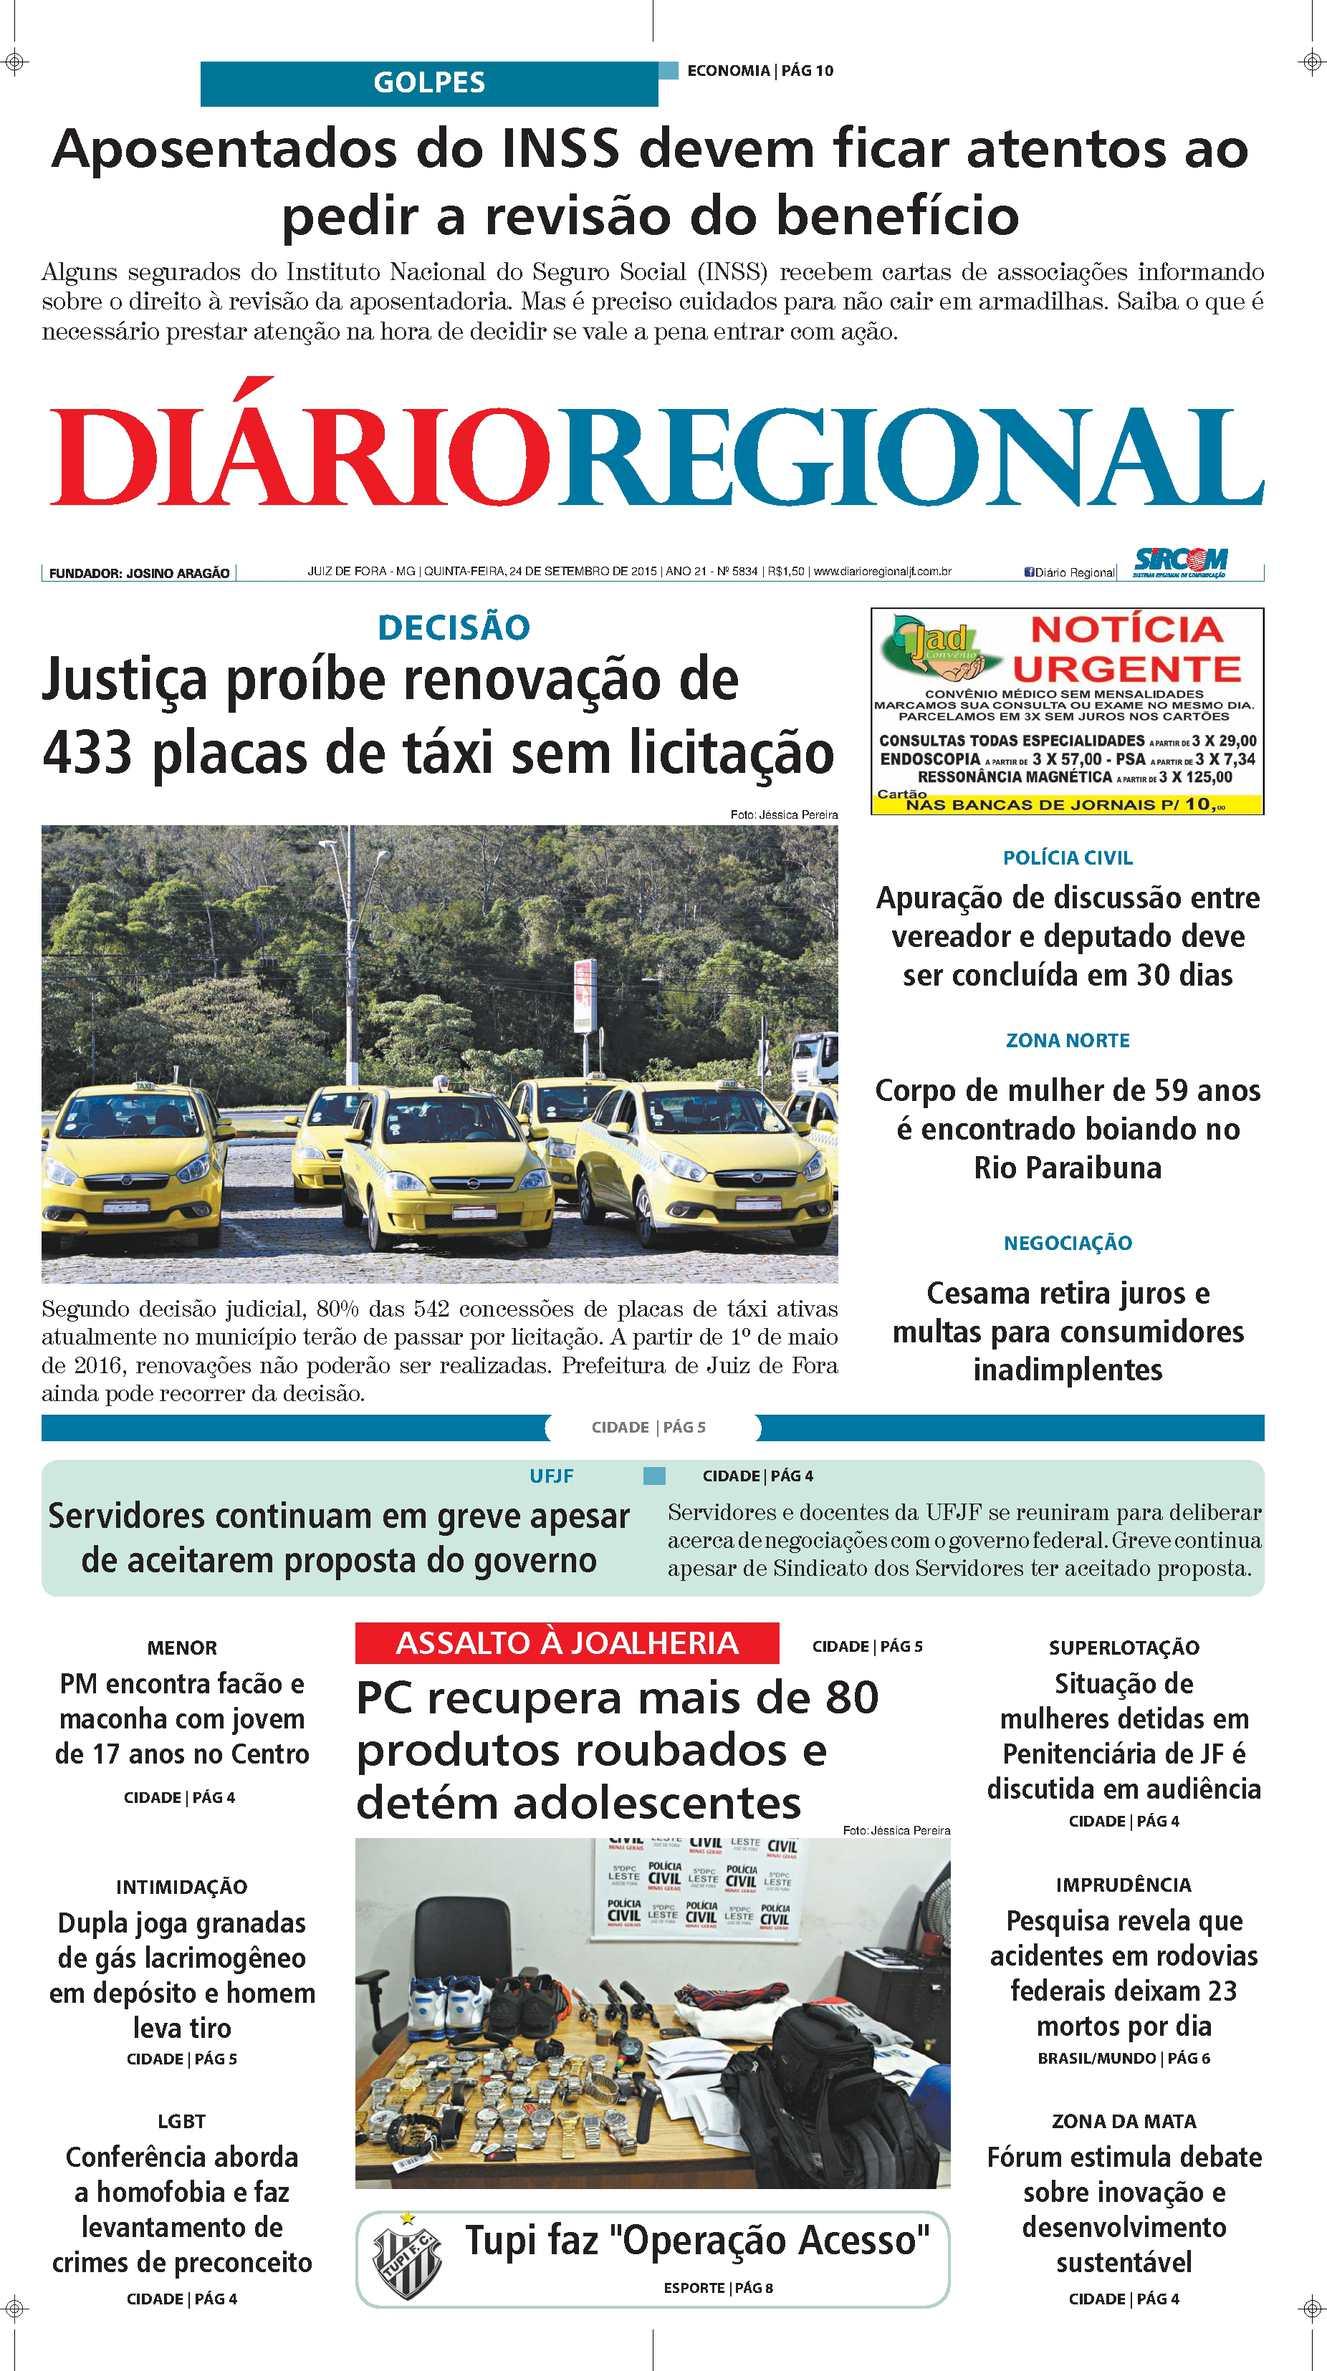 Calaméo - Jornal Site 24 9 15 27b6f706fbe30